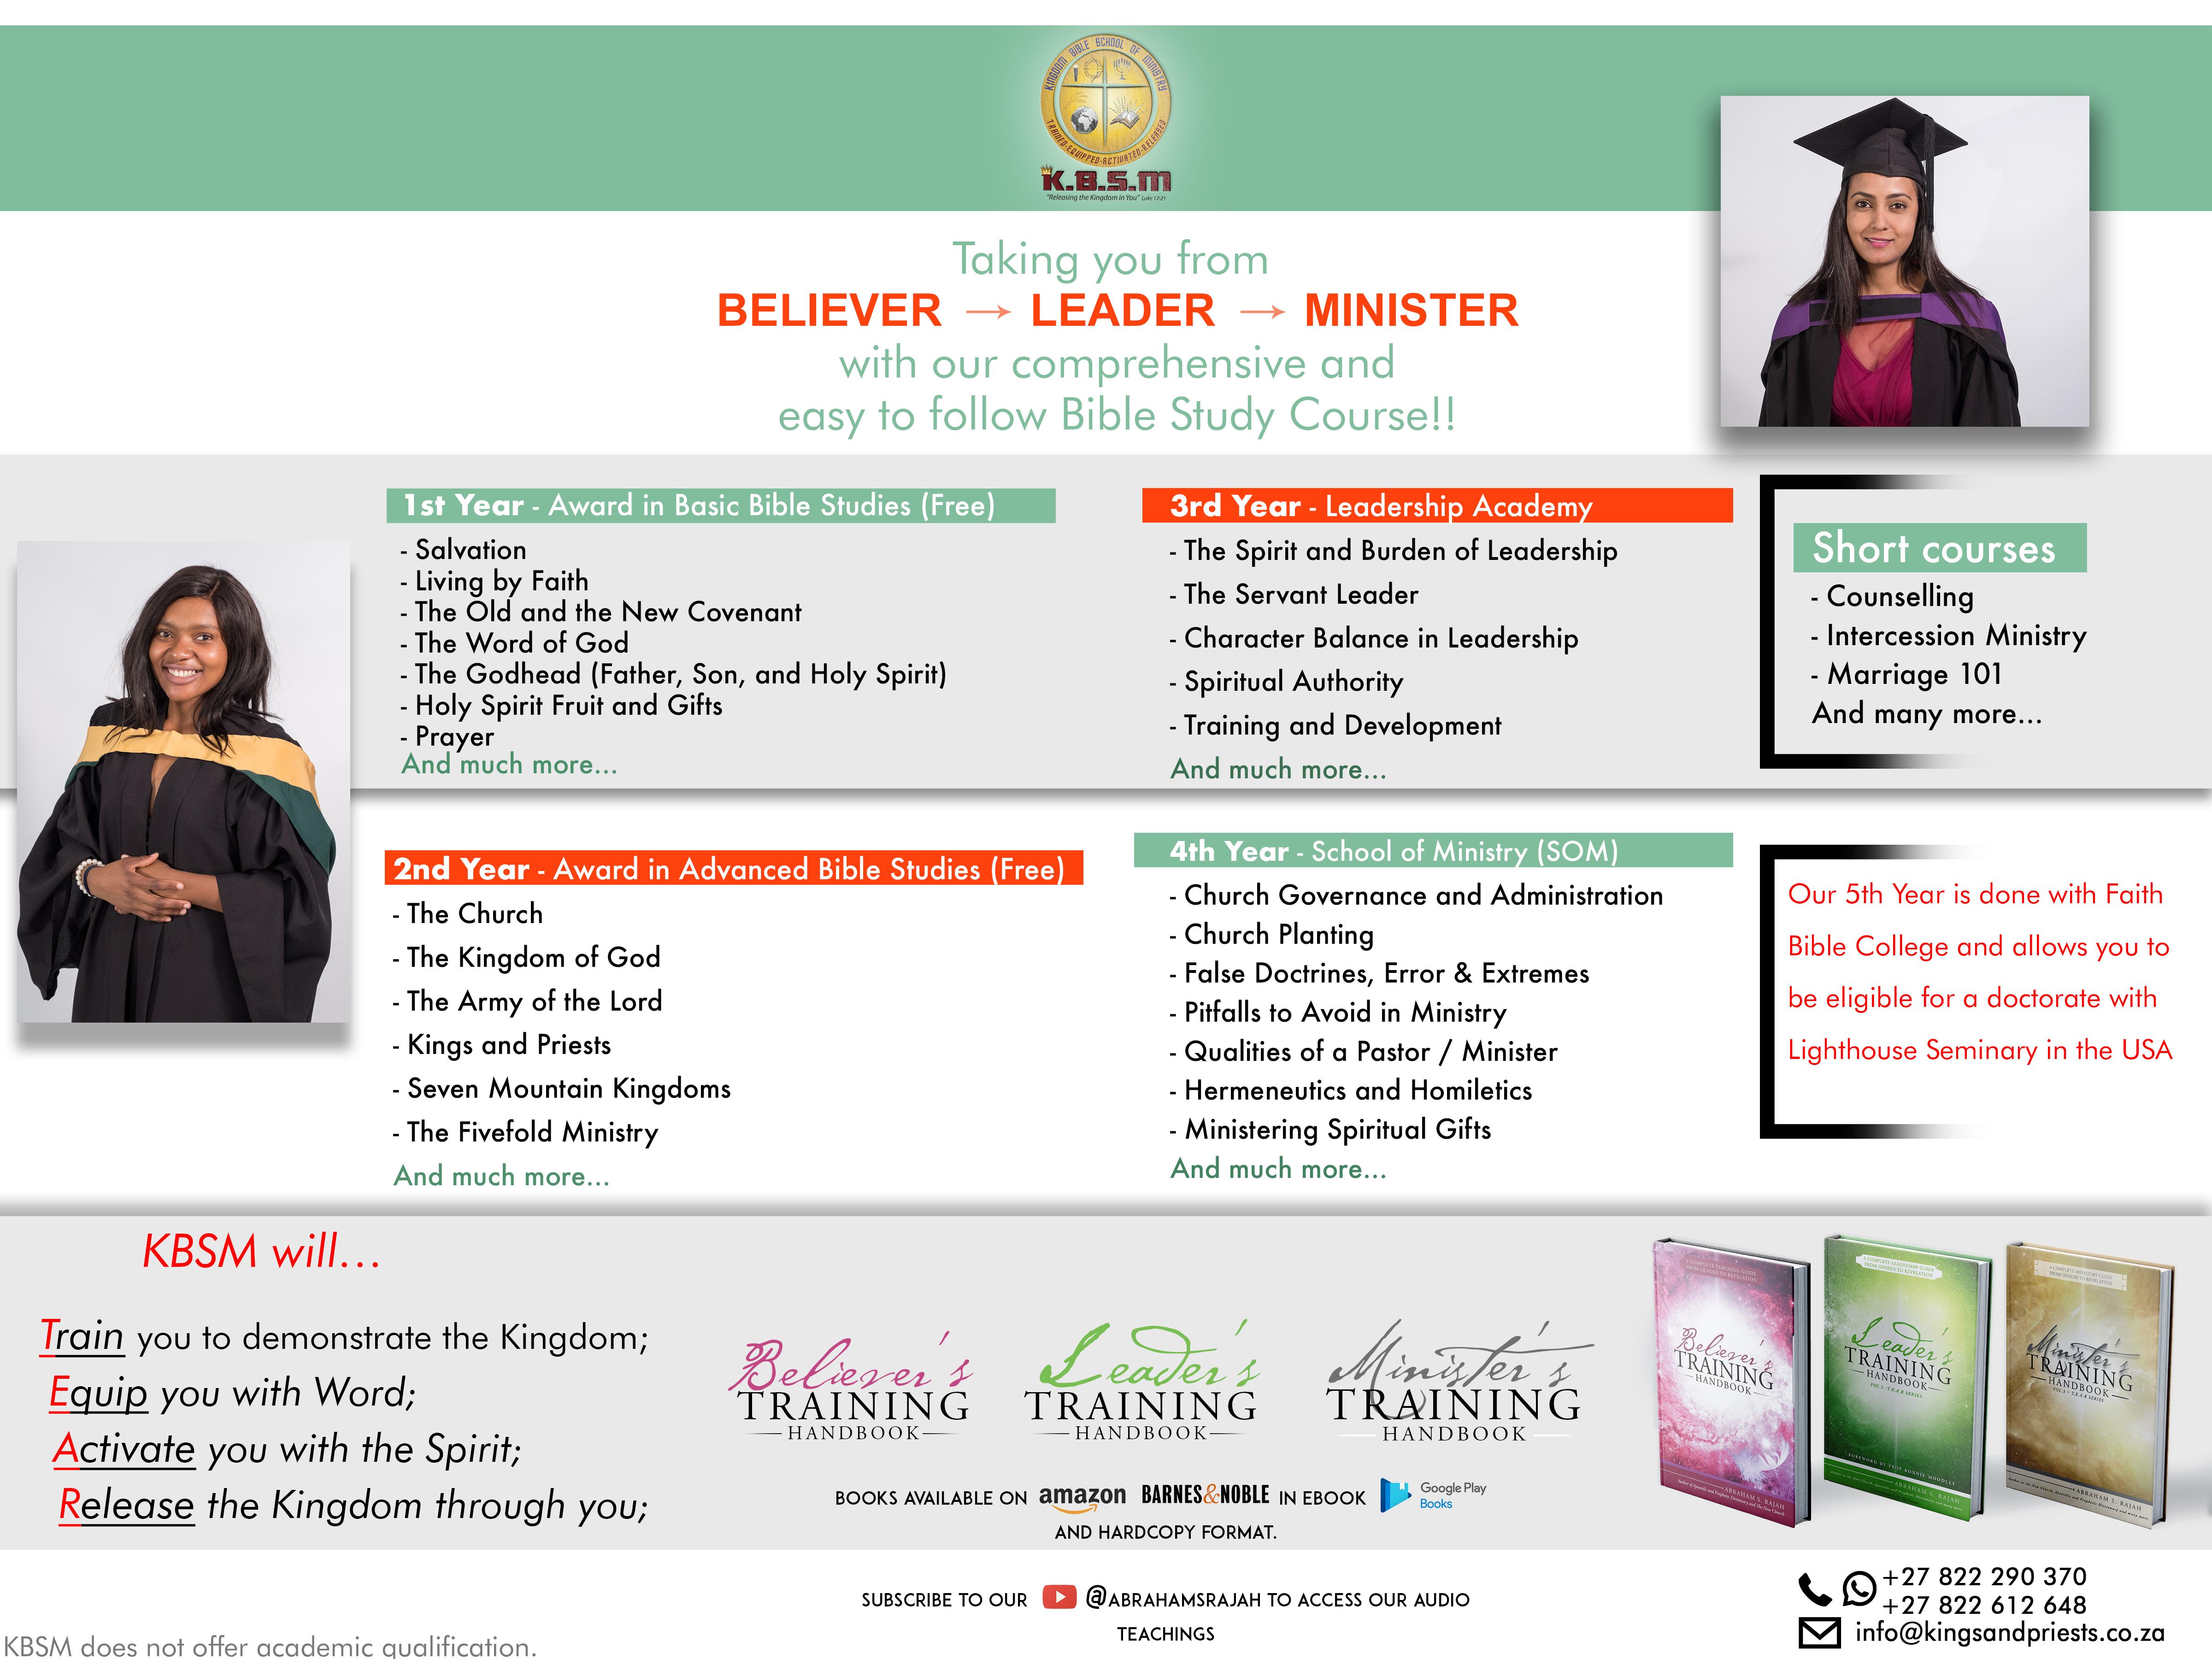 Kingdom Bible School of Ministry